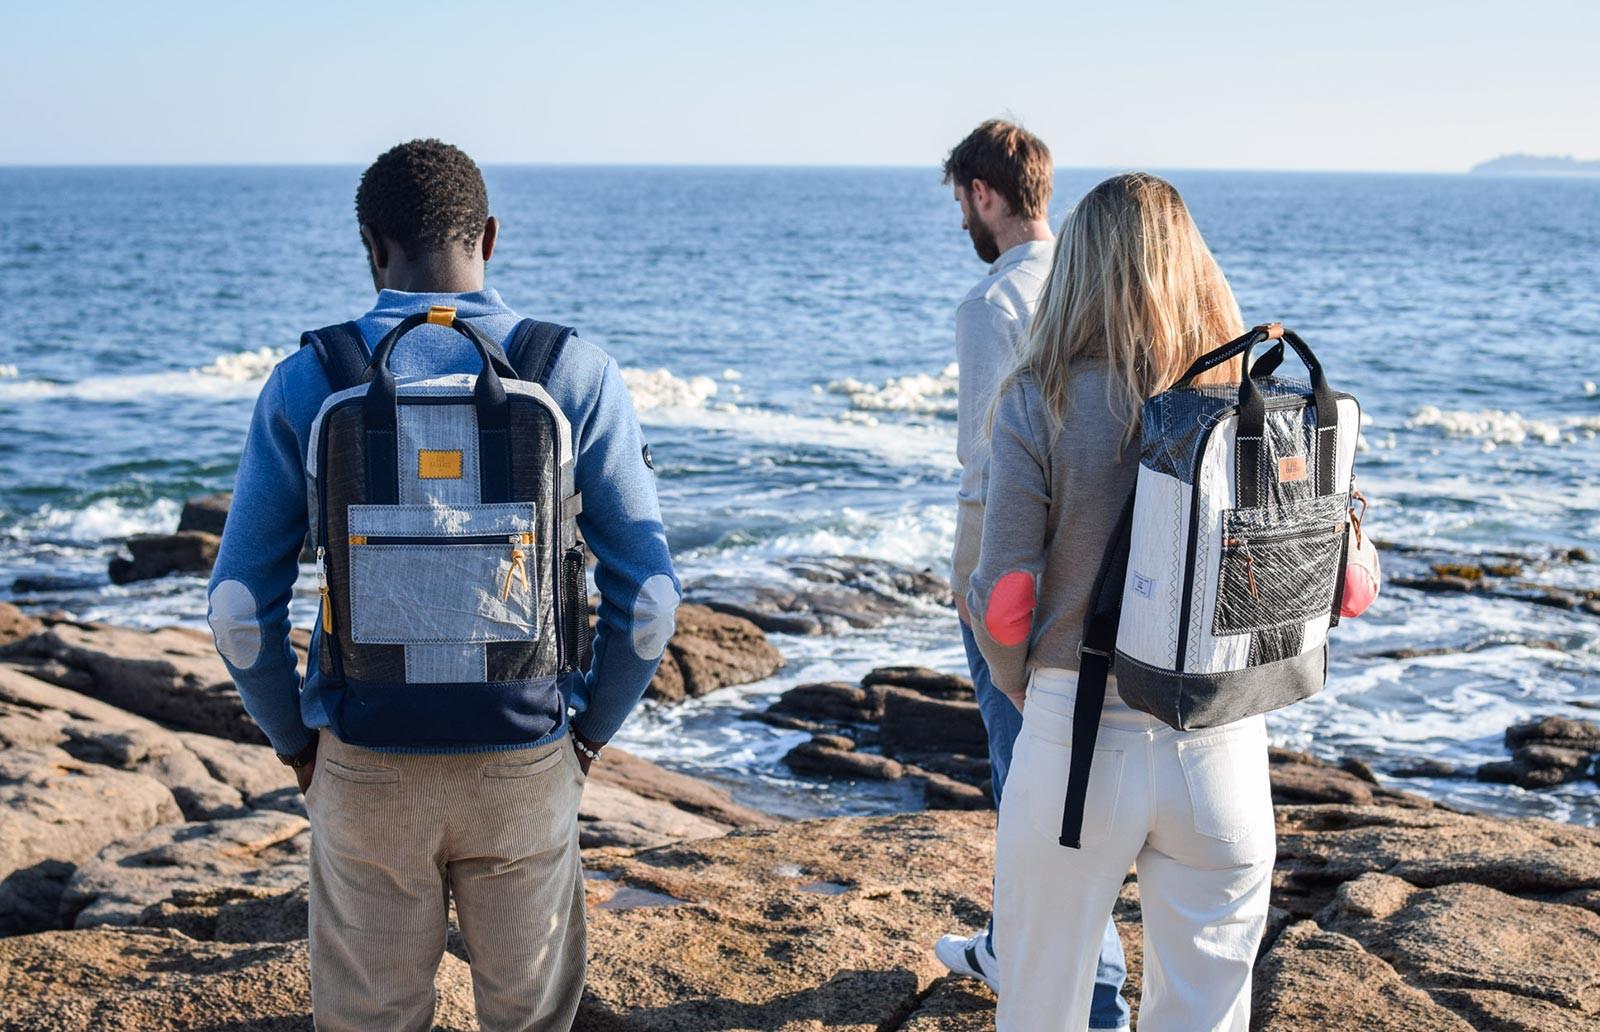 The Wally Backpacks